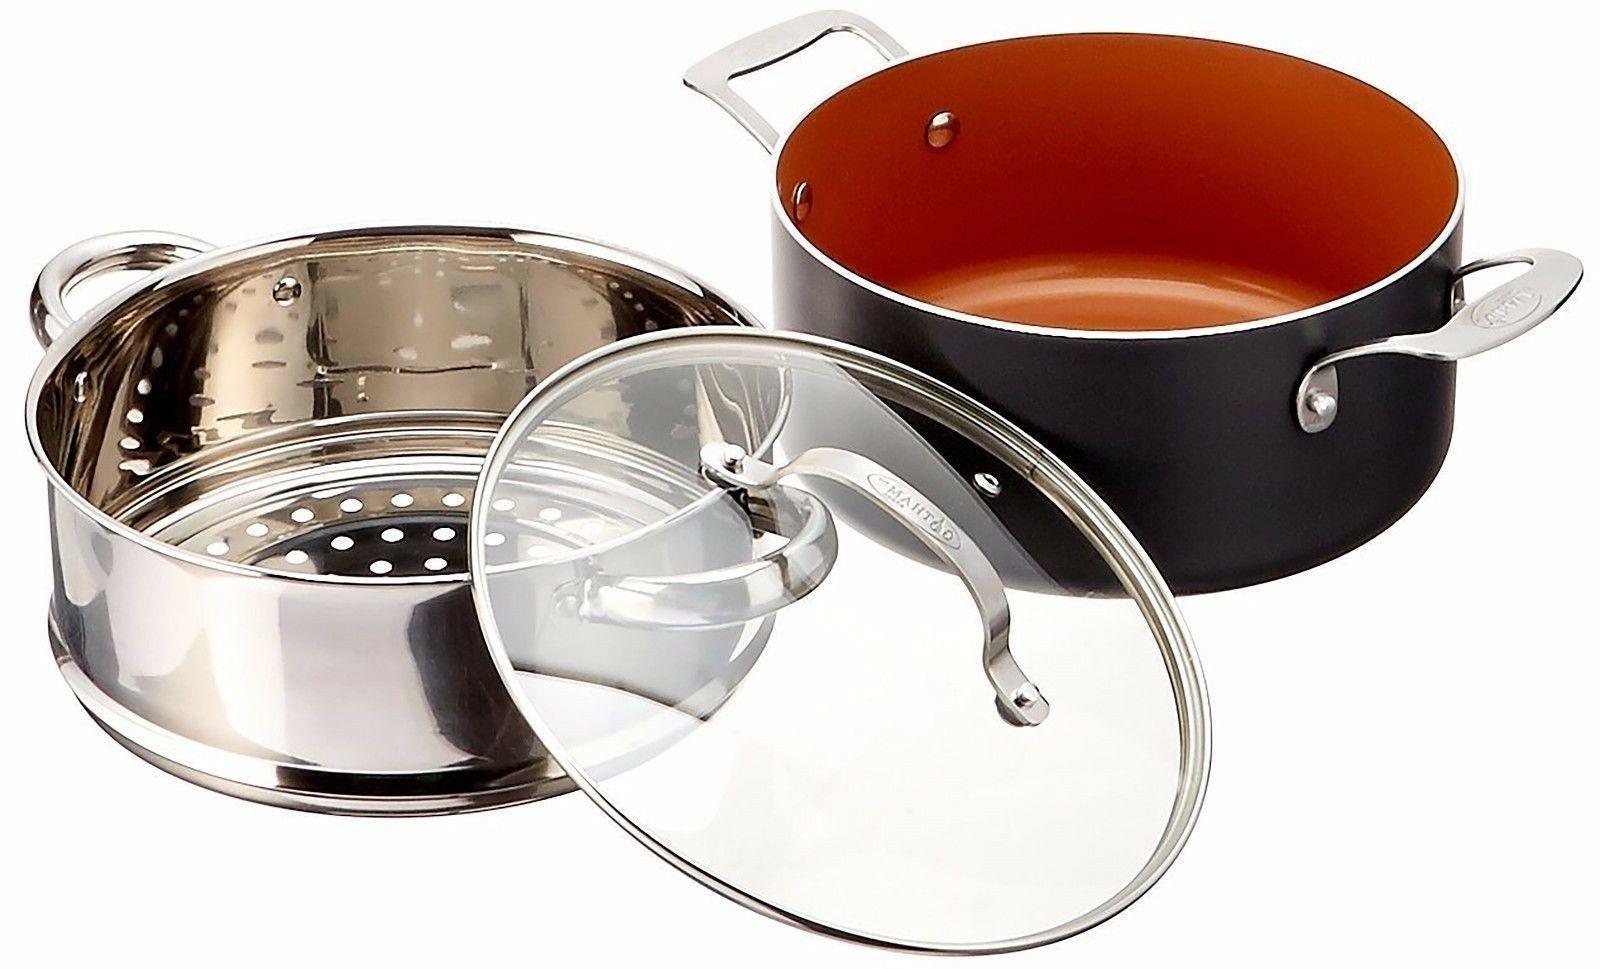 "GOTHAM 10-Piece Nonstick Frying Set 9.5"" Pan"